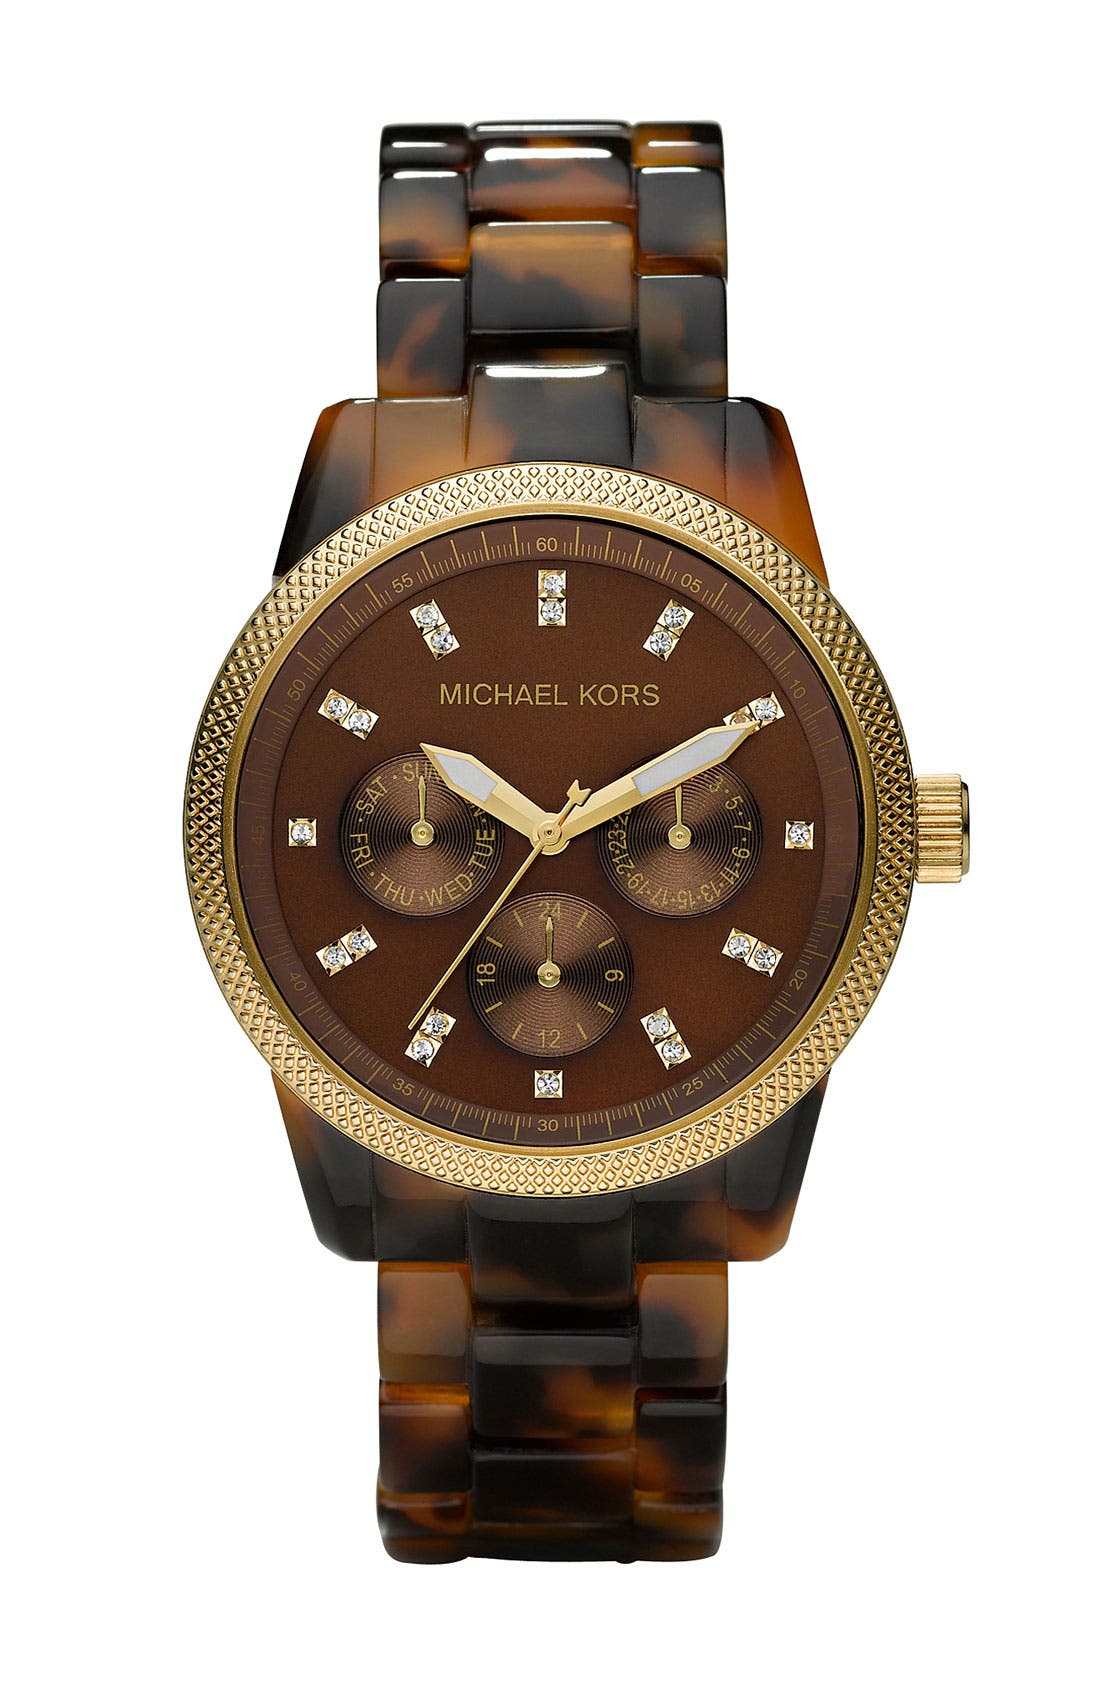 Main Image - Michael Kors 'Jet Set' Bracelet Watch, 38mm